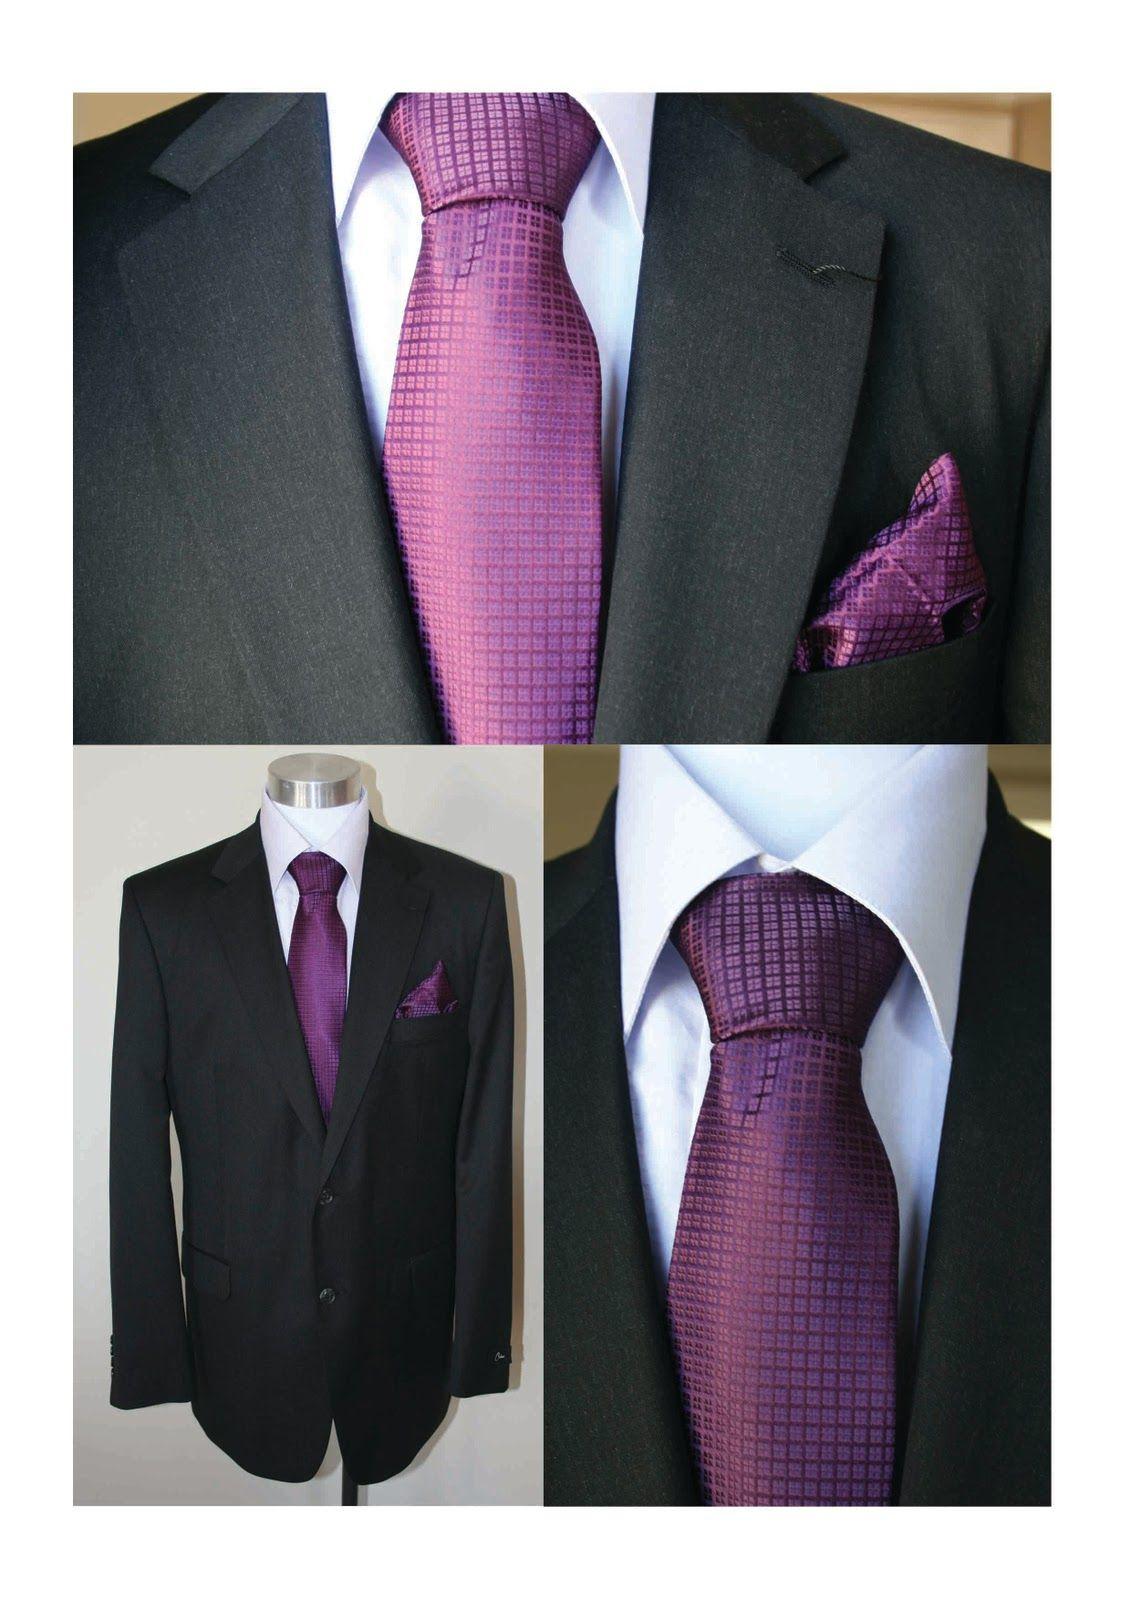 Black suits with purple ties :)